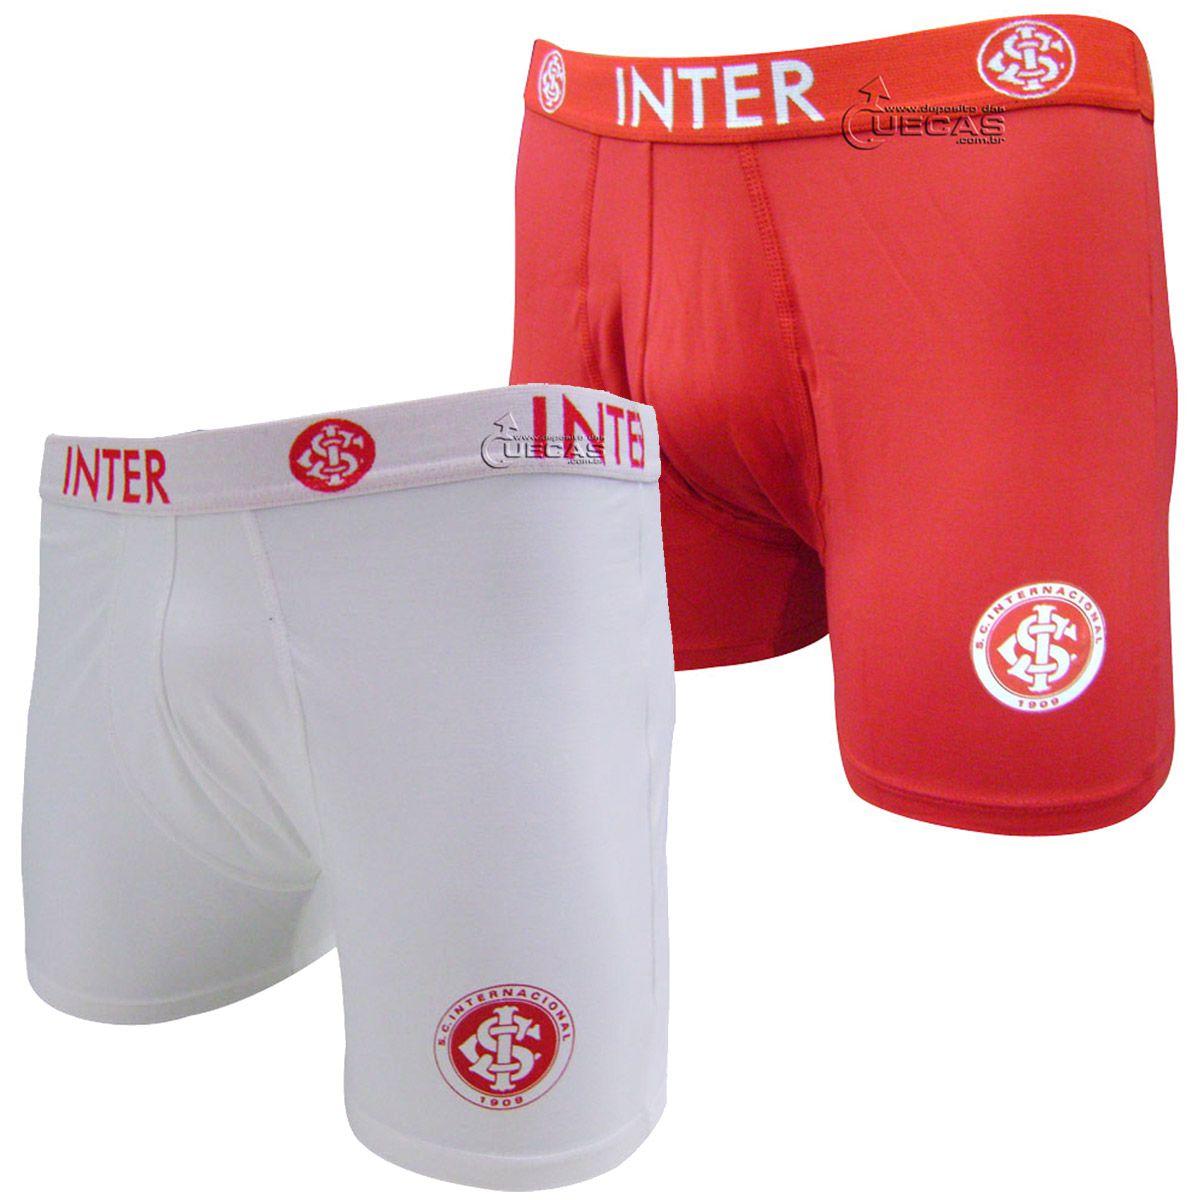 Cueca Boxer do Internacional Microfibra c/Silk - 04.0001